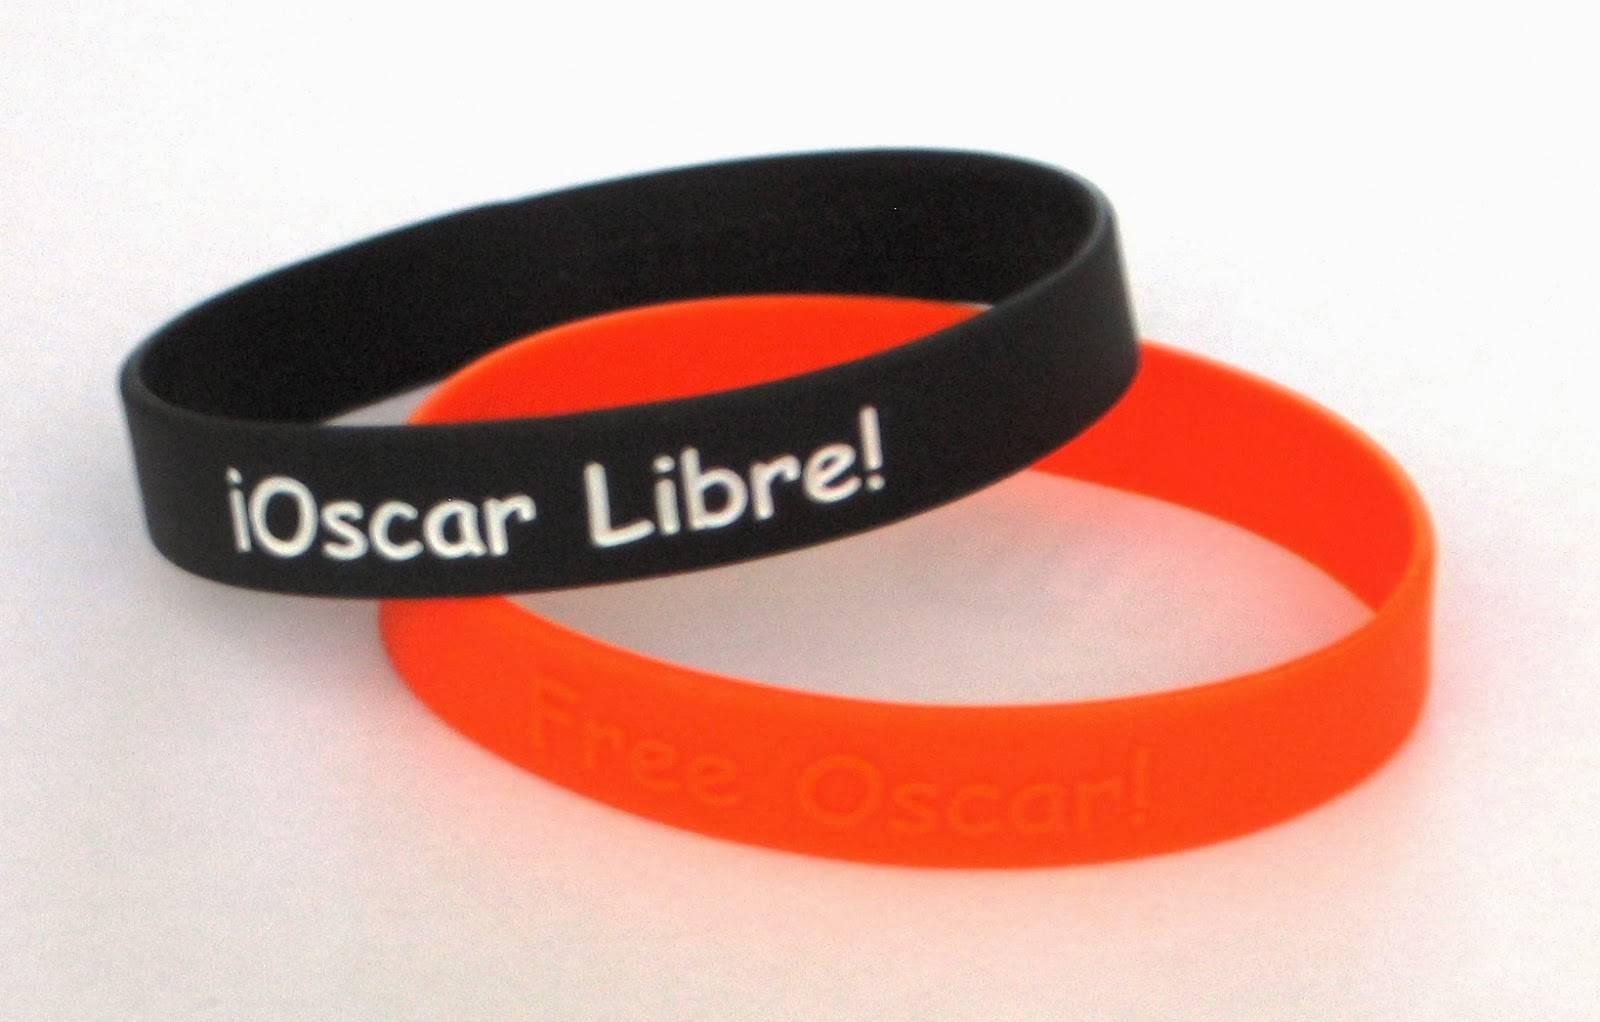 oscarbracelet-58da69c57d30d1597f604b65f7ff4545.jpg